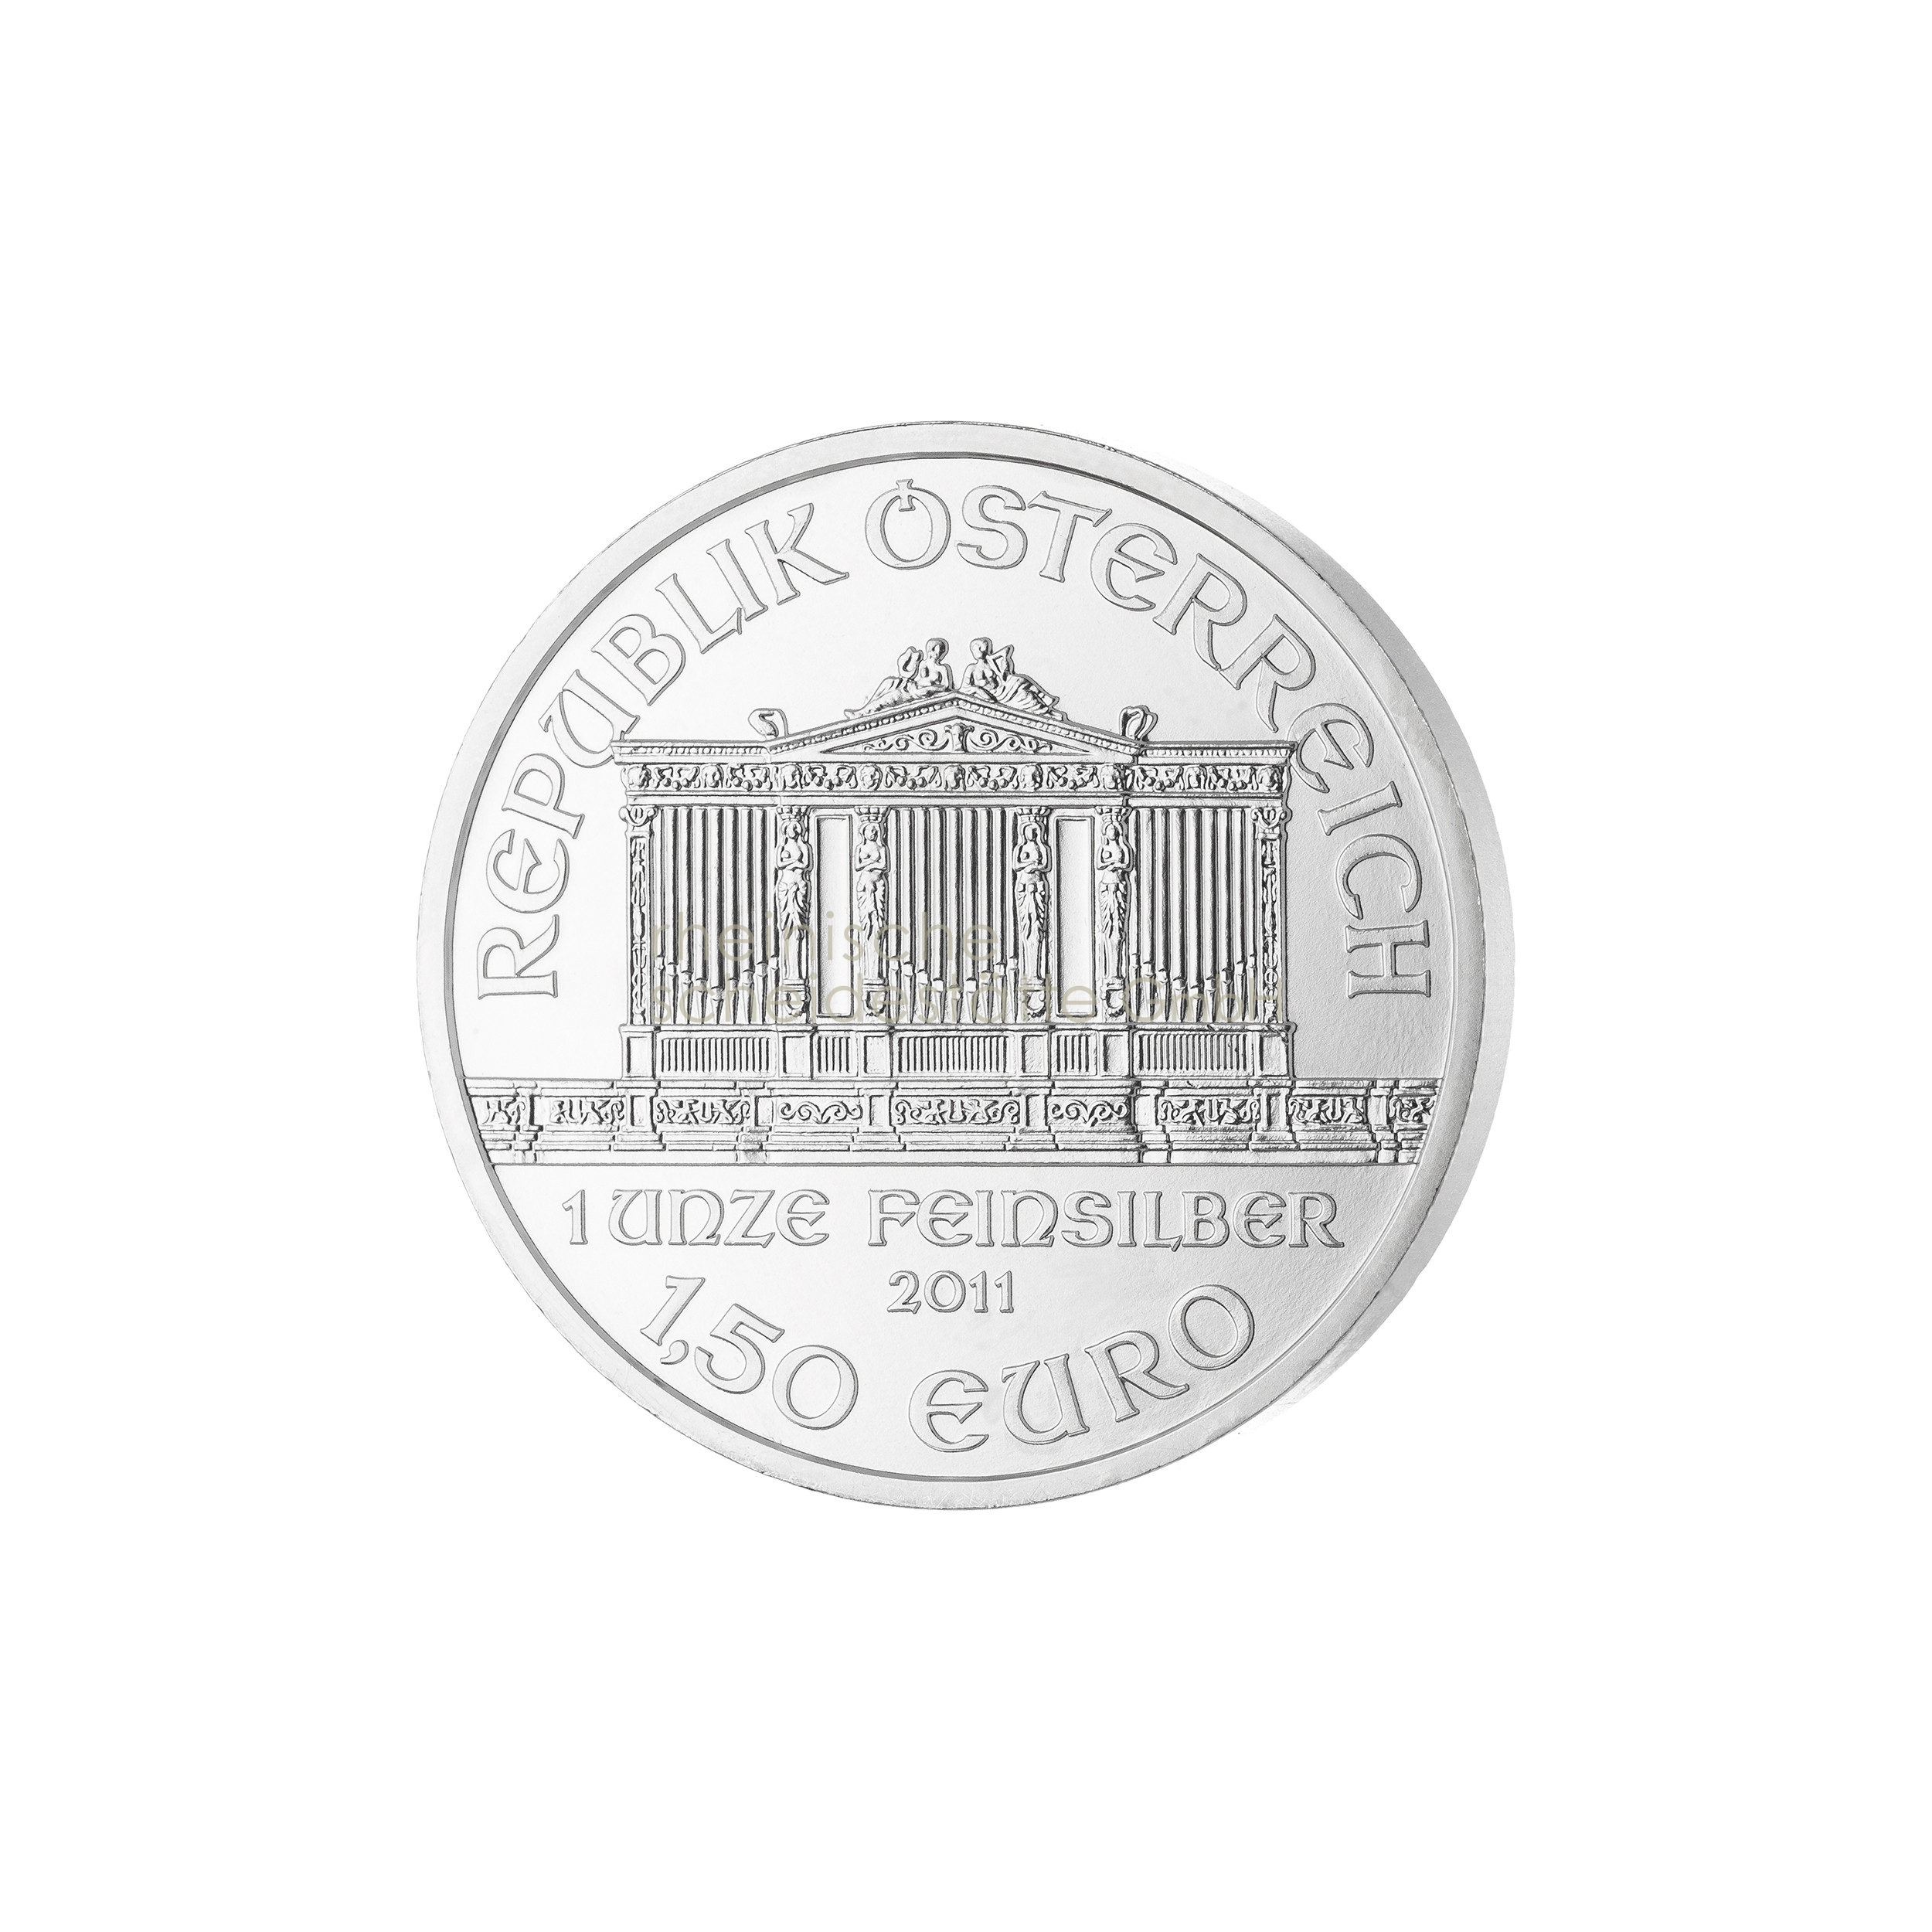 1 Unze Wiener Philharmoniker Silbermünze a